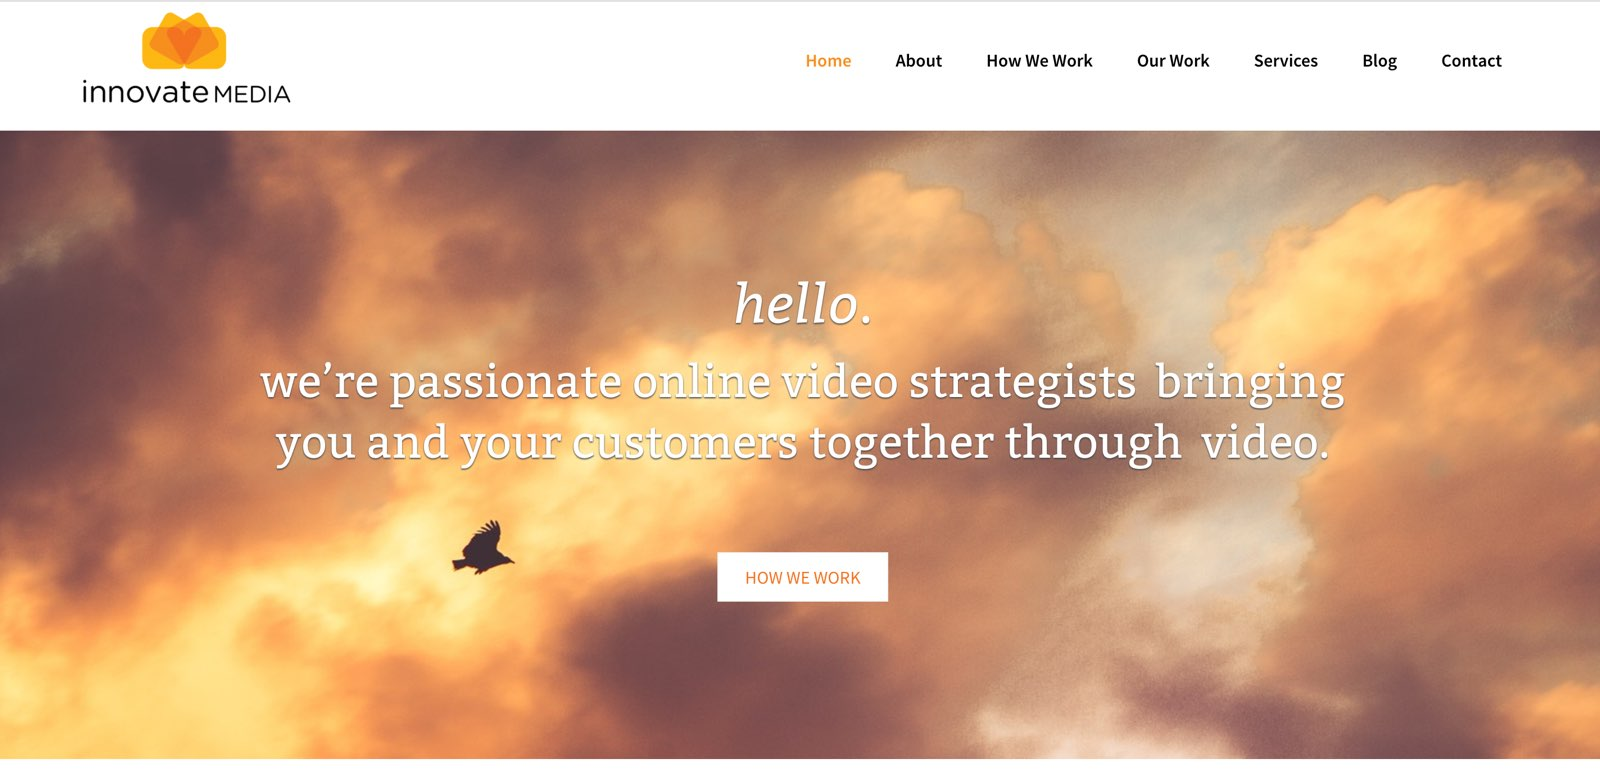 innovate-media-website